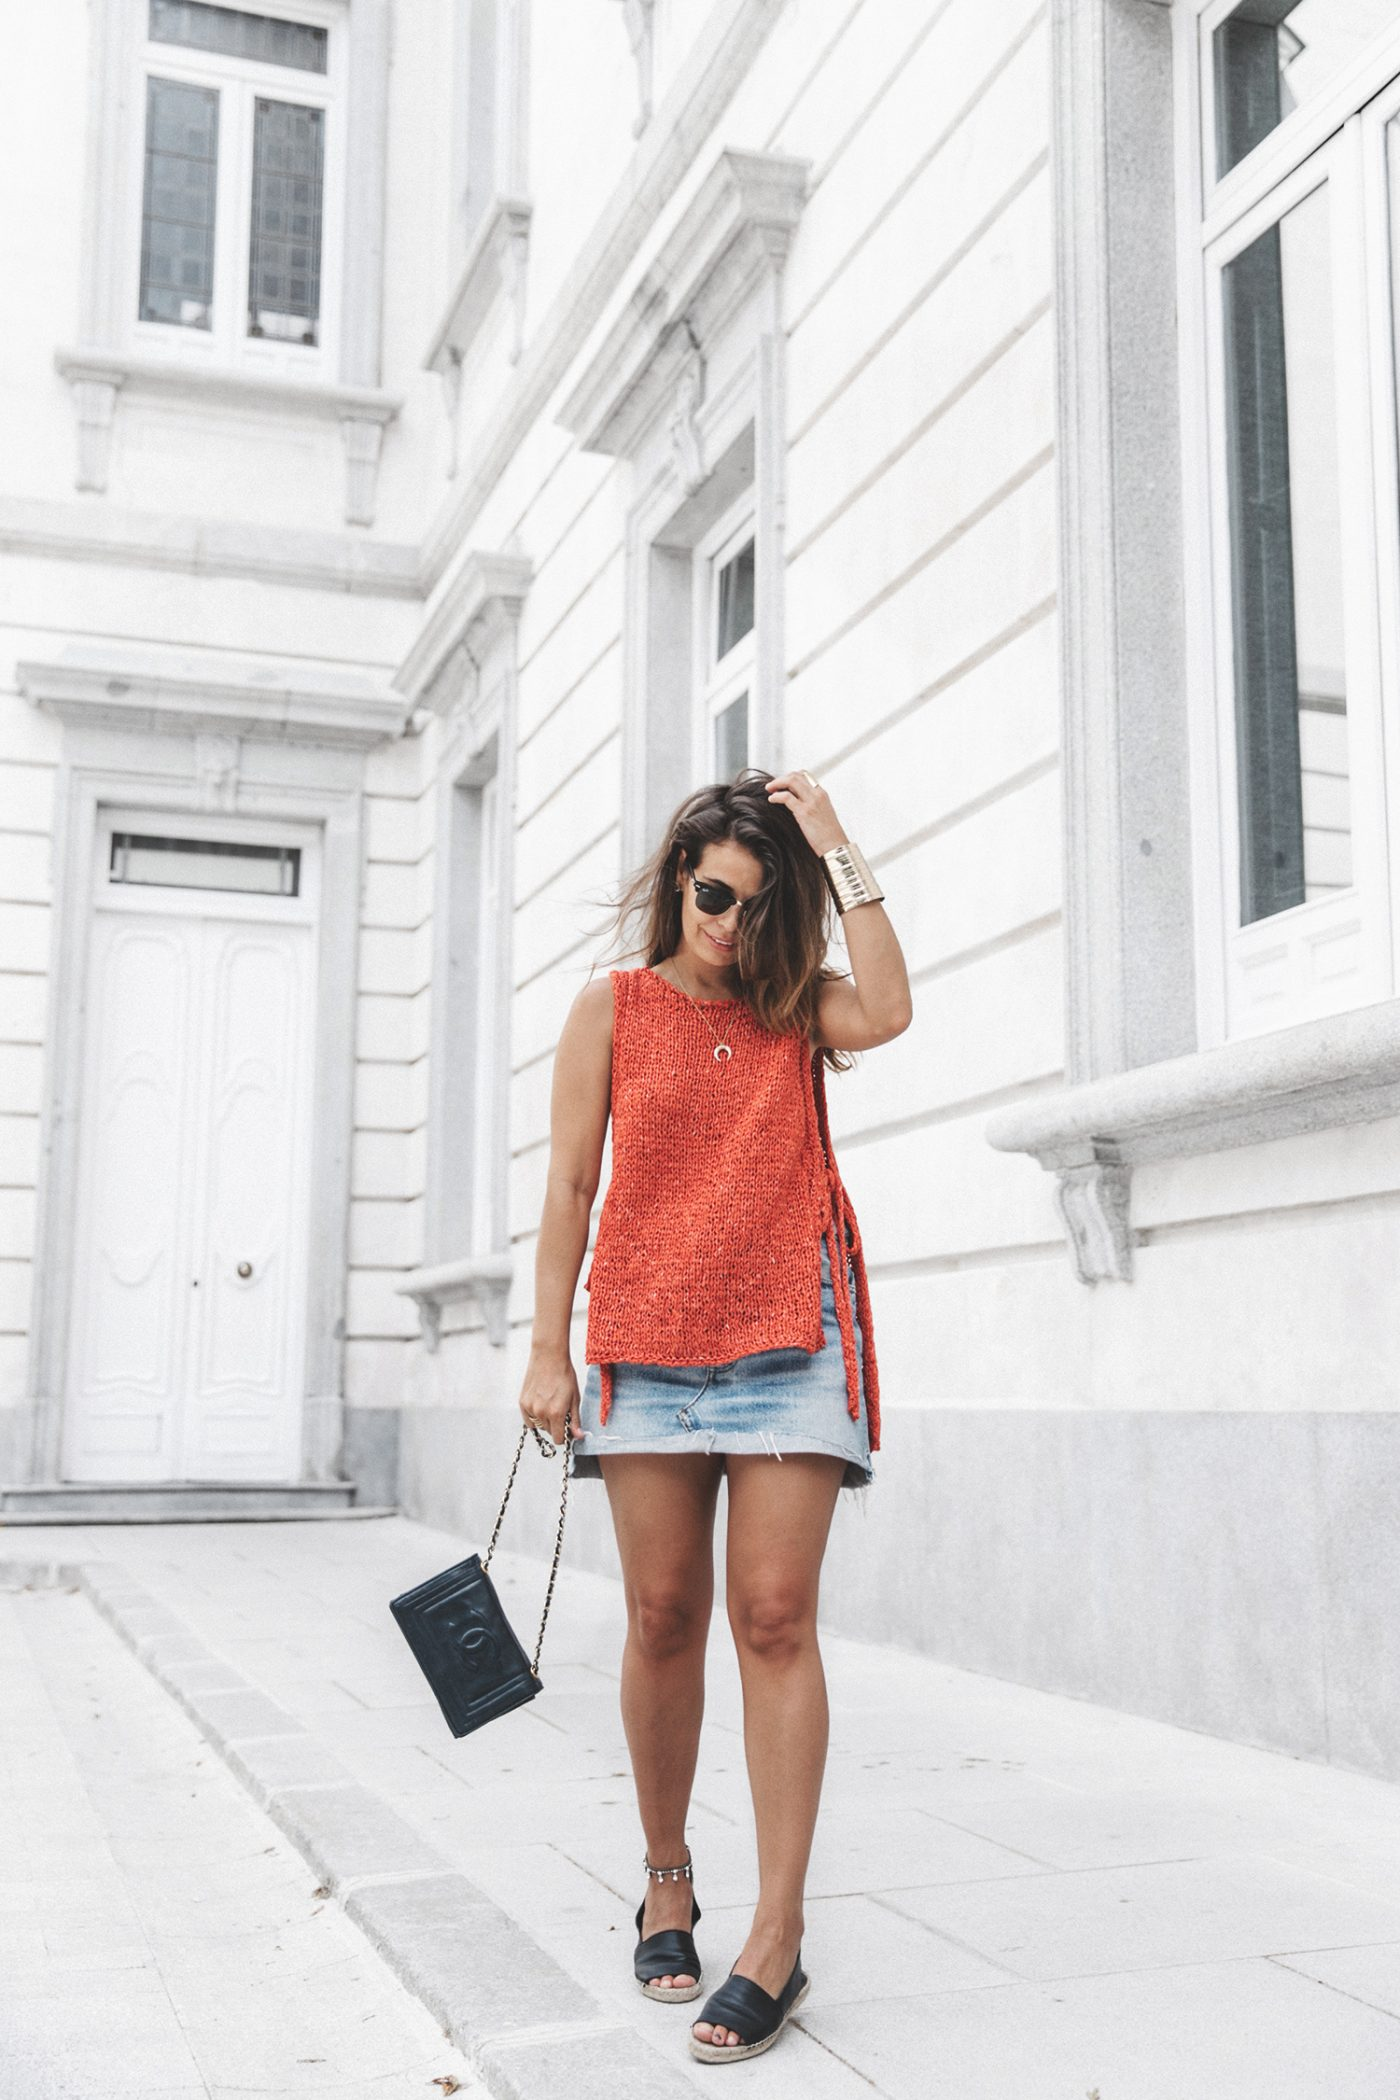 Summery_knit-Levis_Vintage_Skirt-Zalando_Espadrilles-Black_Sandals-Collage_Vintage_Horn_Necklace-Outfit-Street_Style-35